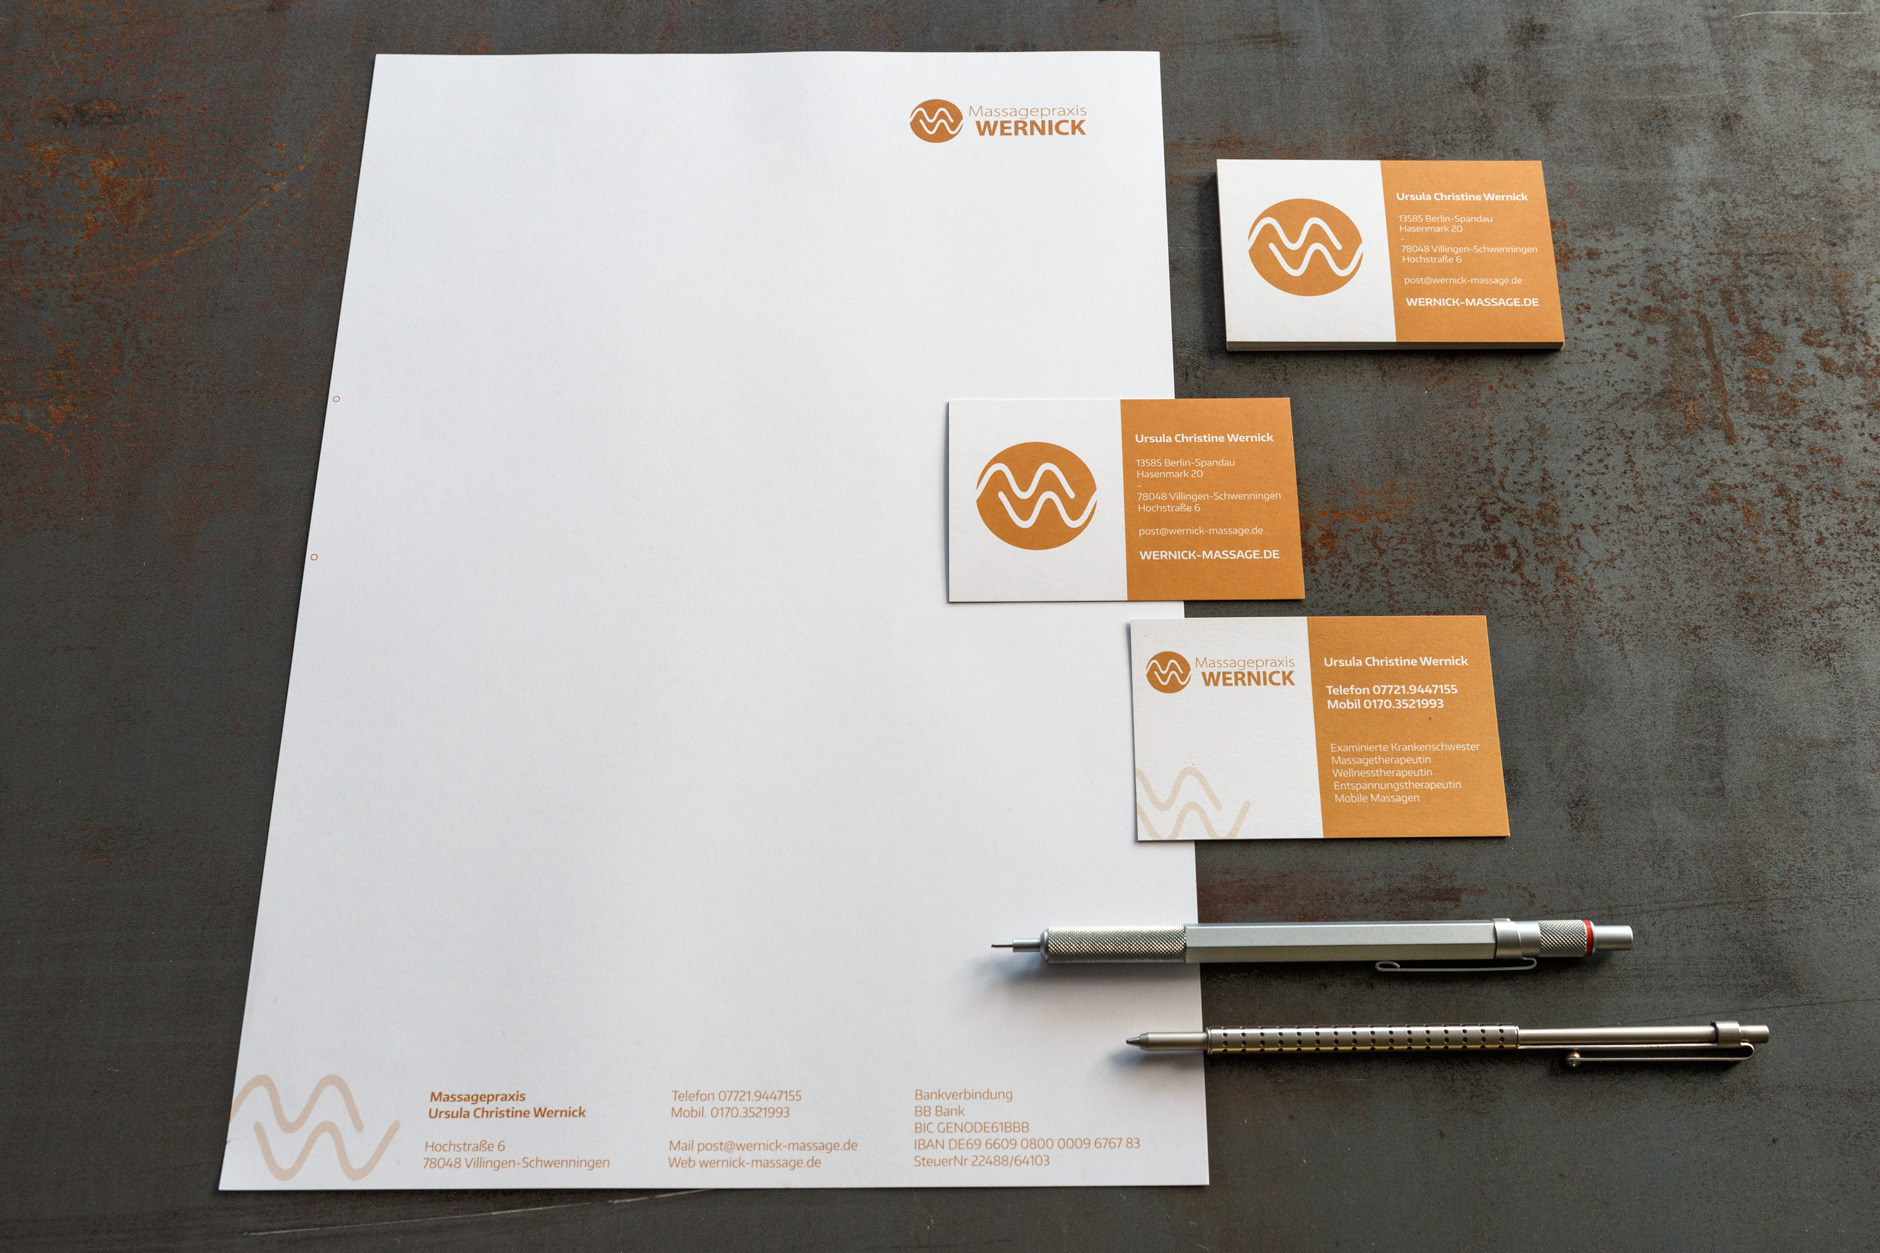 Wernick Visitenkarten Briefpapier Flyer Tectradesign